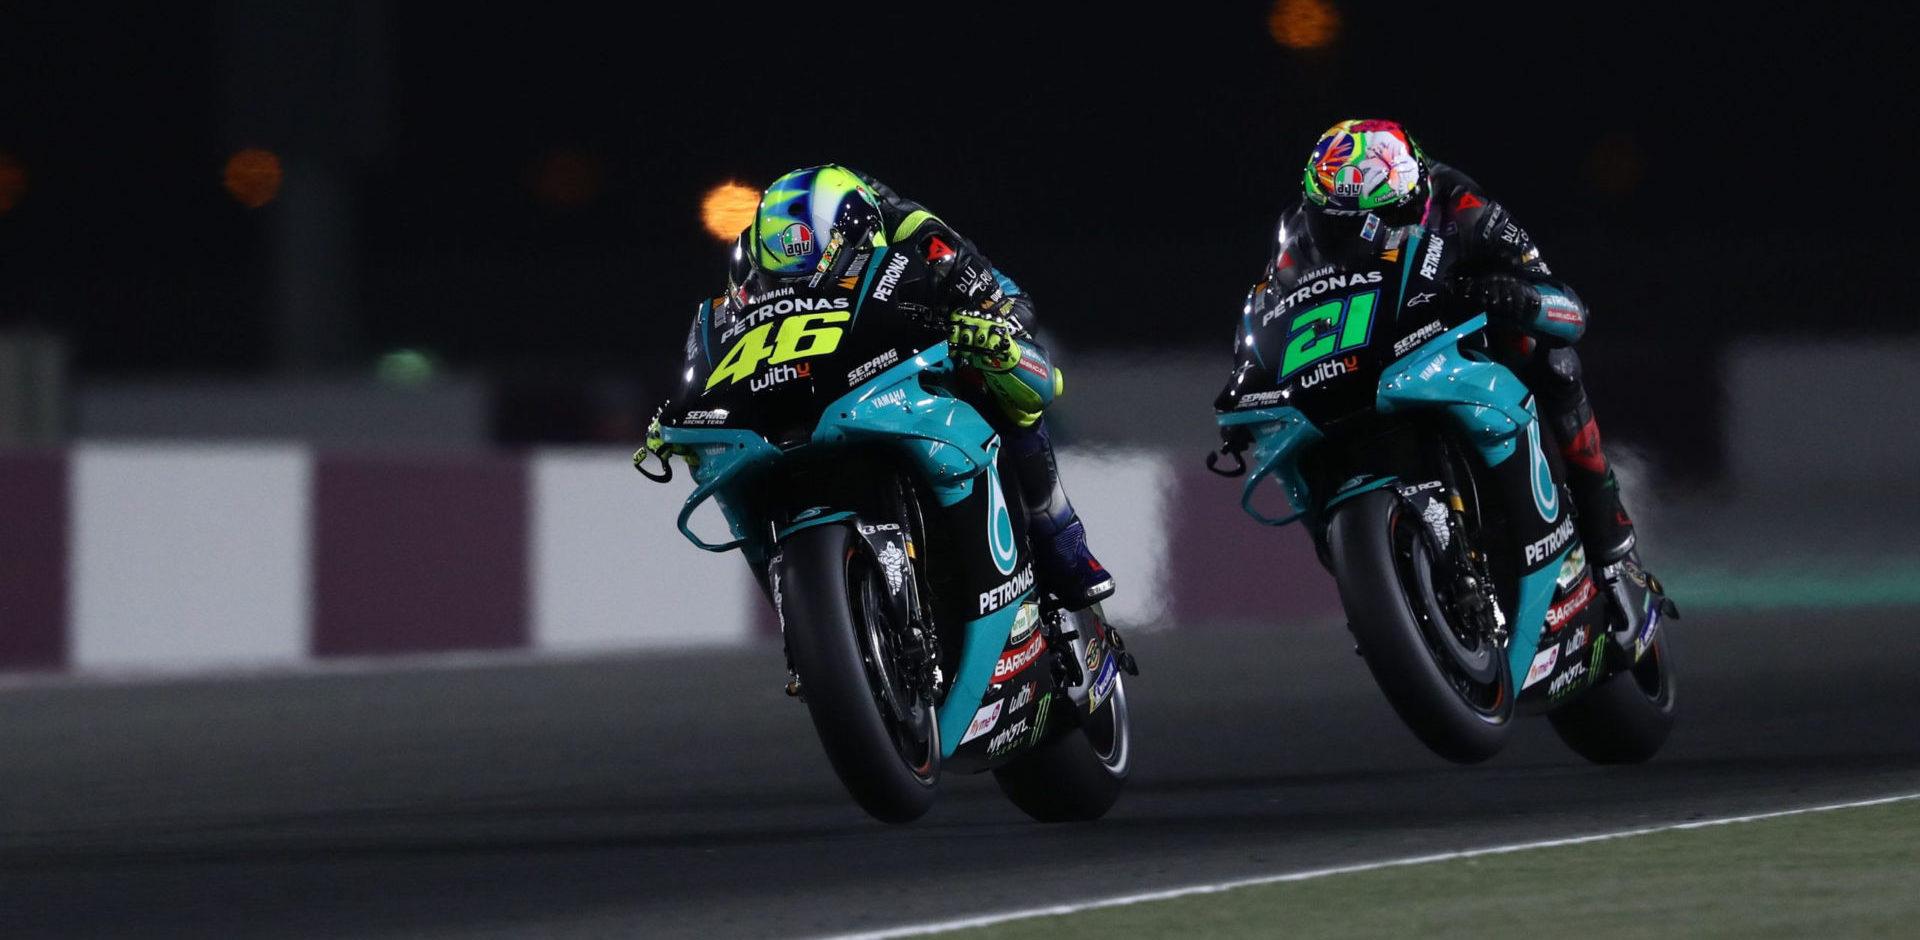 Franco Morbidelli (21) and Valentino Rossi (46). Photo courtesy PETRONAS Yamaha SRT.